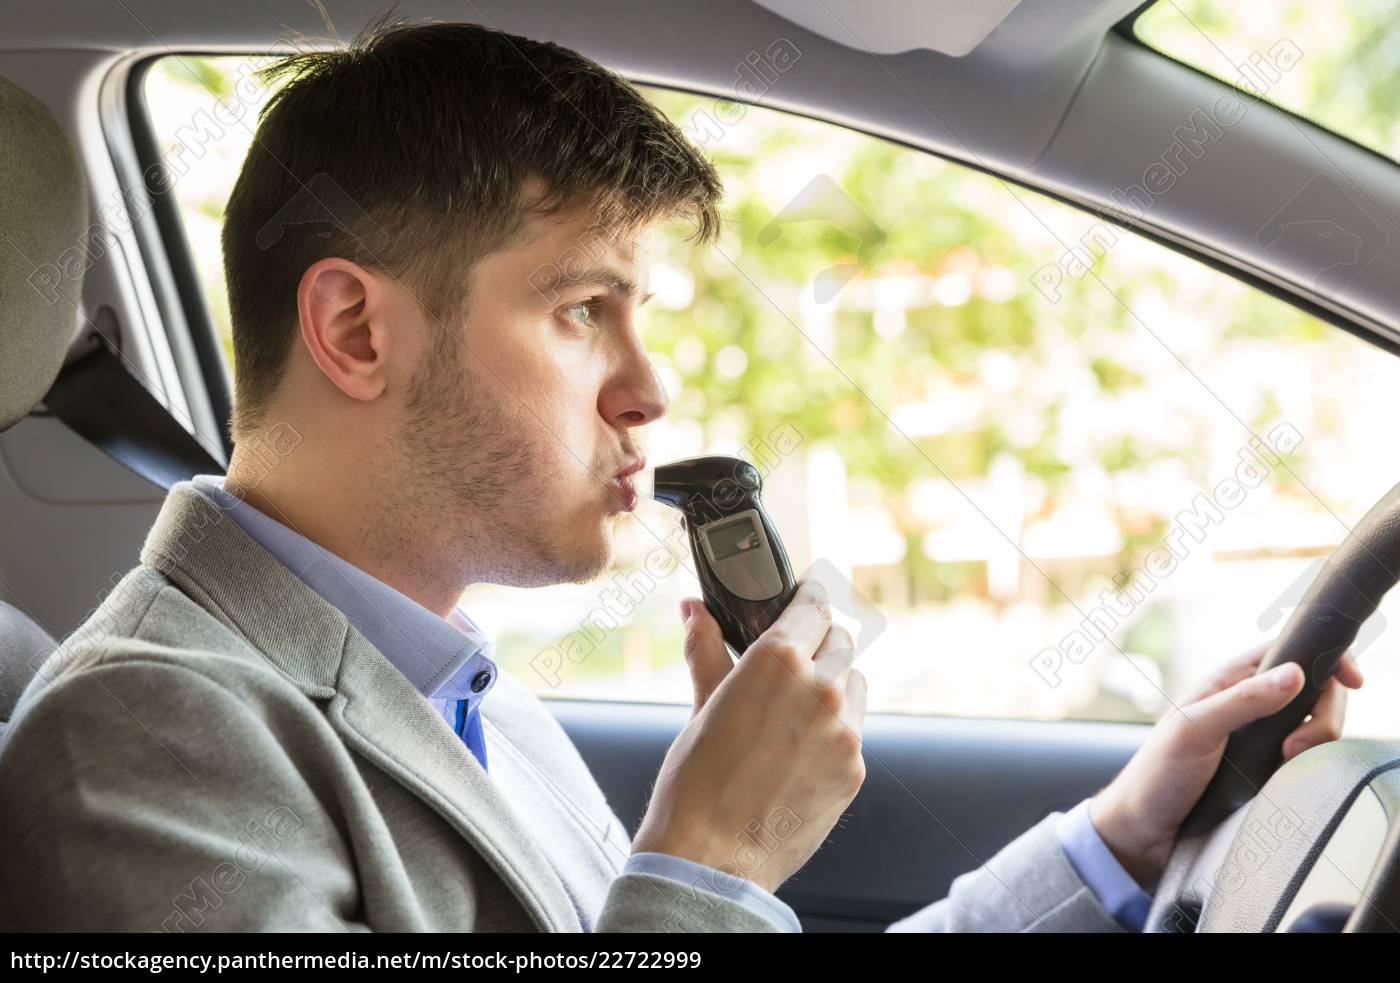 man, sitting, inside, car, taking, alcohol - 22722999